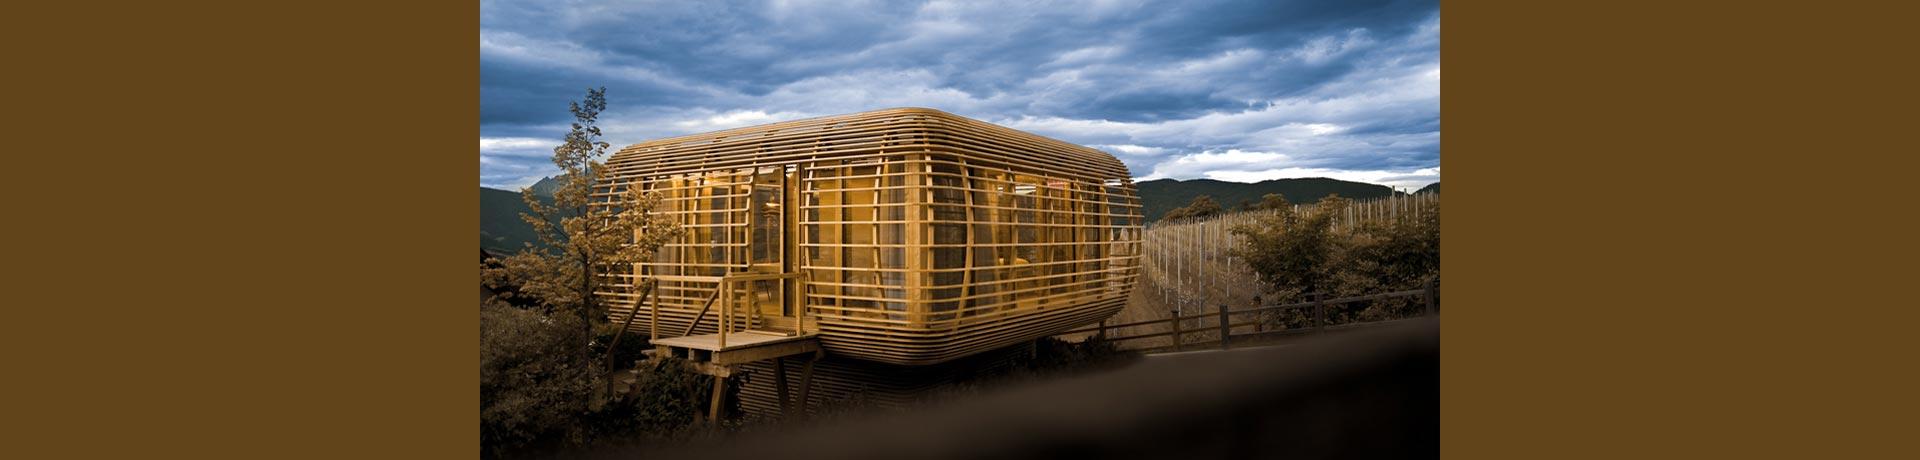 slide4-minihaus